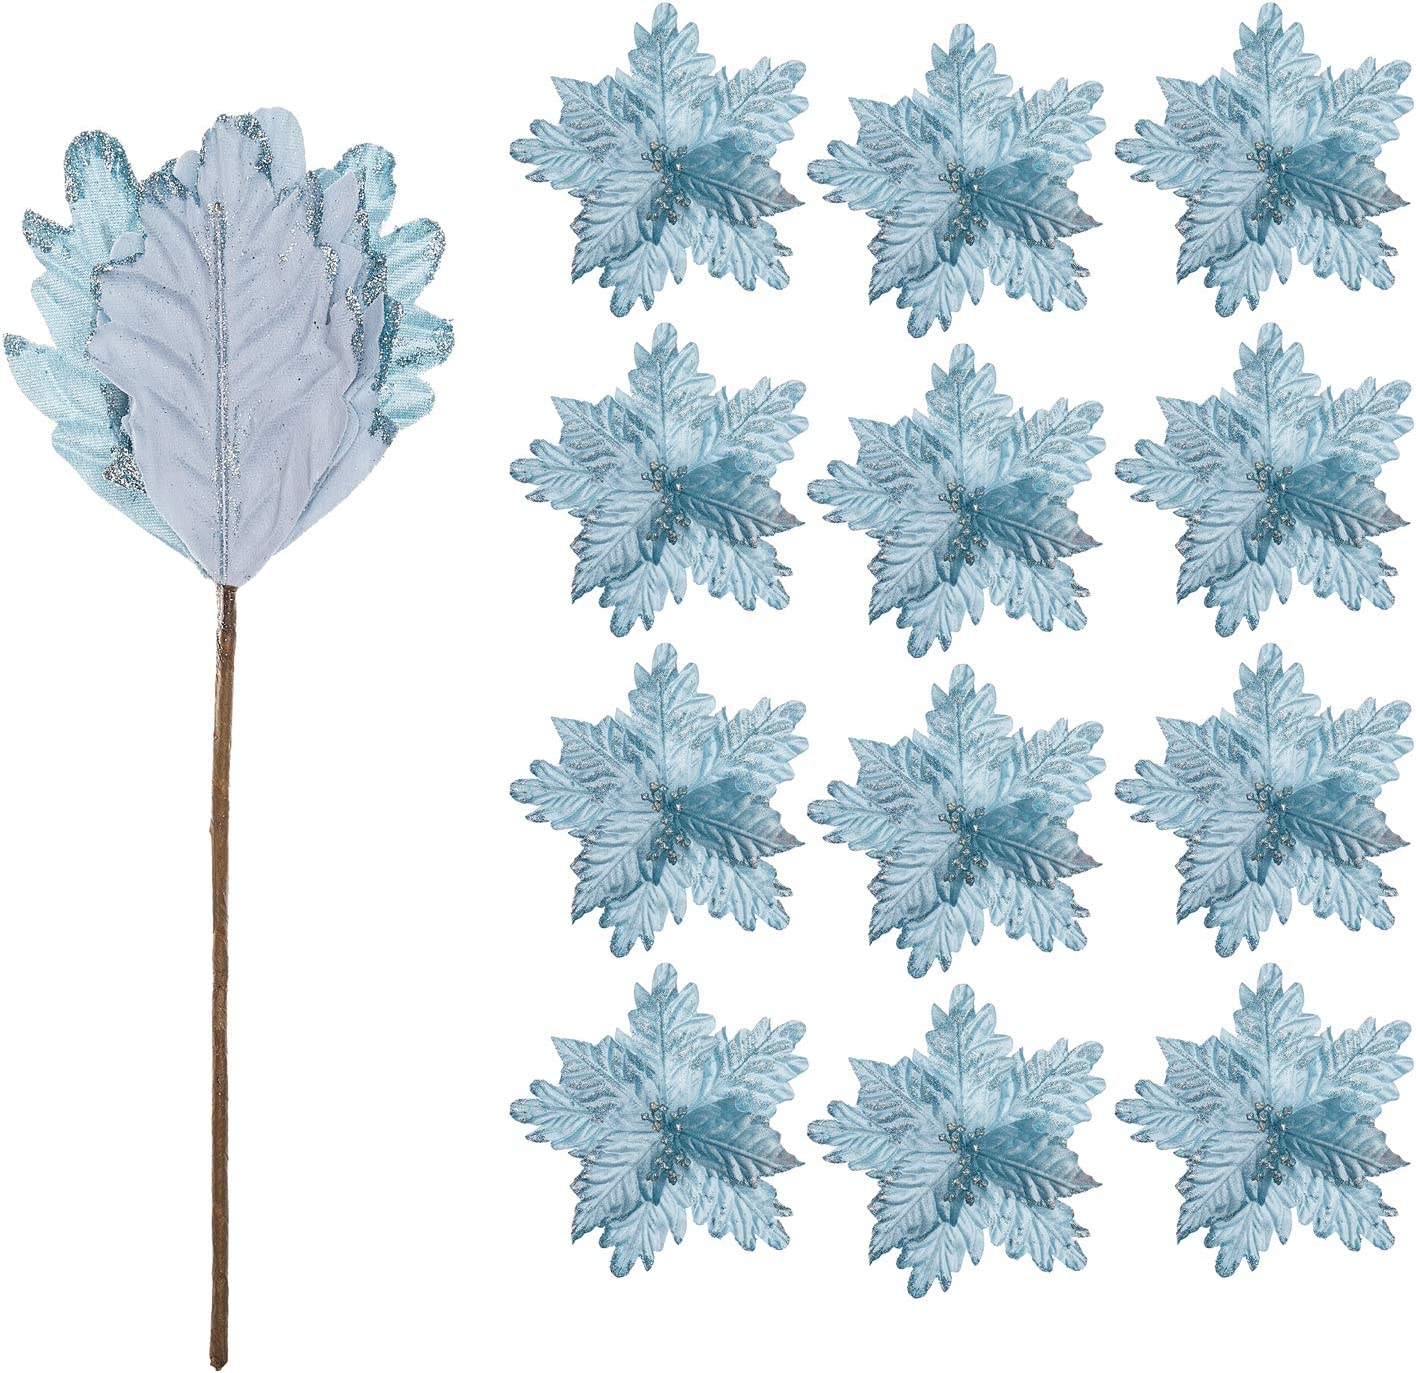 FuleHouzz 12pcs Glitter Decorated Large Poinsettias Decorative Christmas Flower Stems for Christmas Tree Wreaths Wedding Decor, Blue